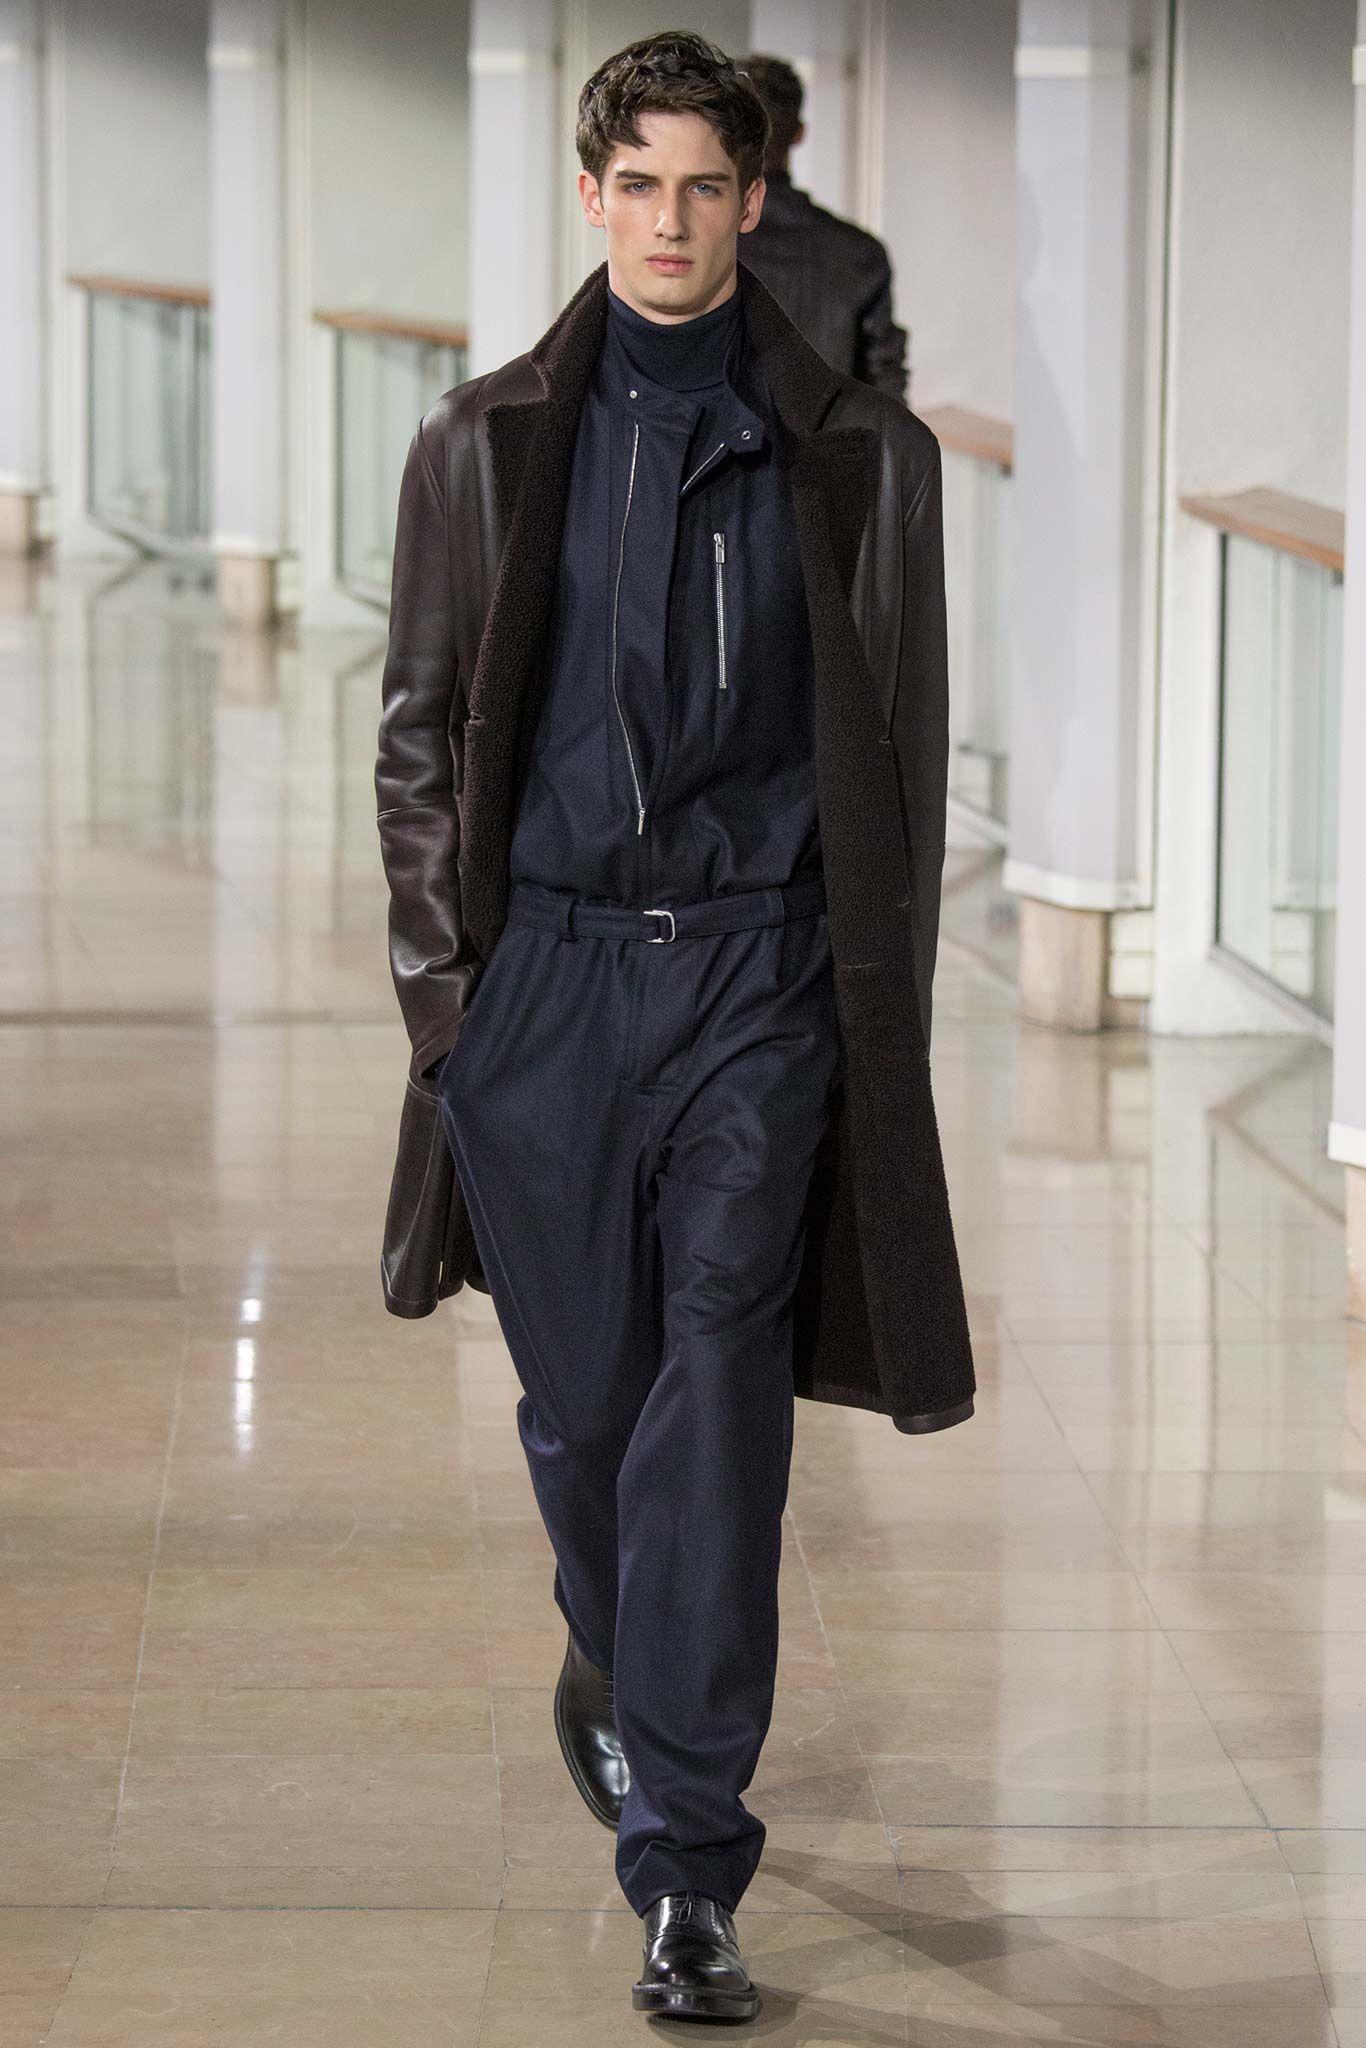 cb6fa90ecb New post on mens-fashion-inspiration. Hermès Fall 2015 Menswear - Collection  - Gallery - Style.com